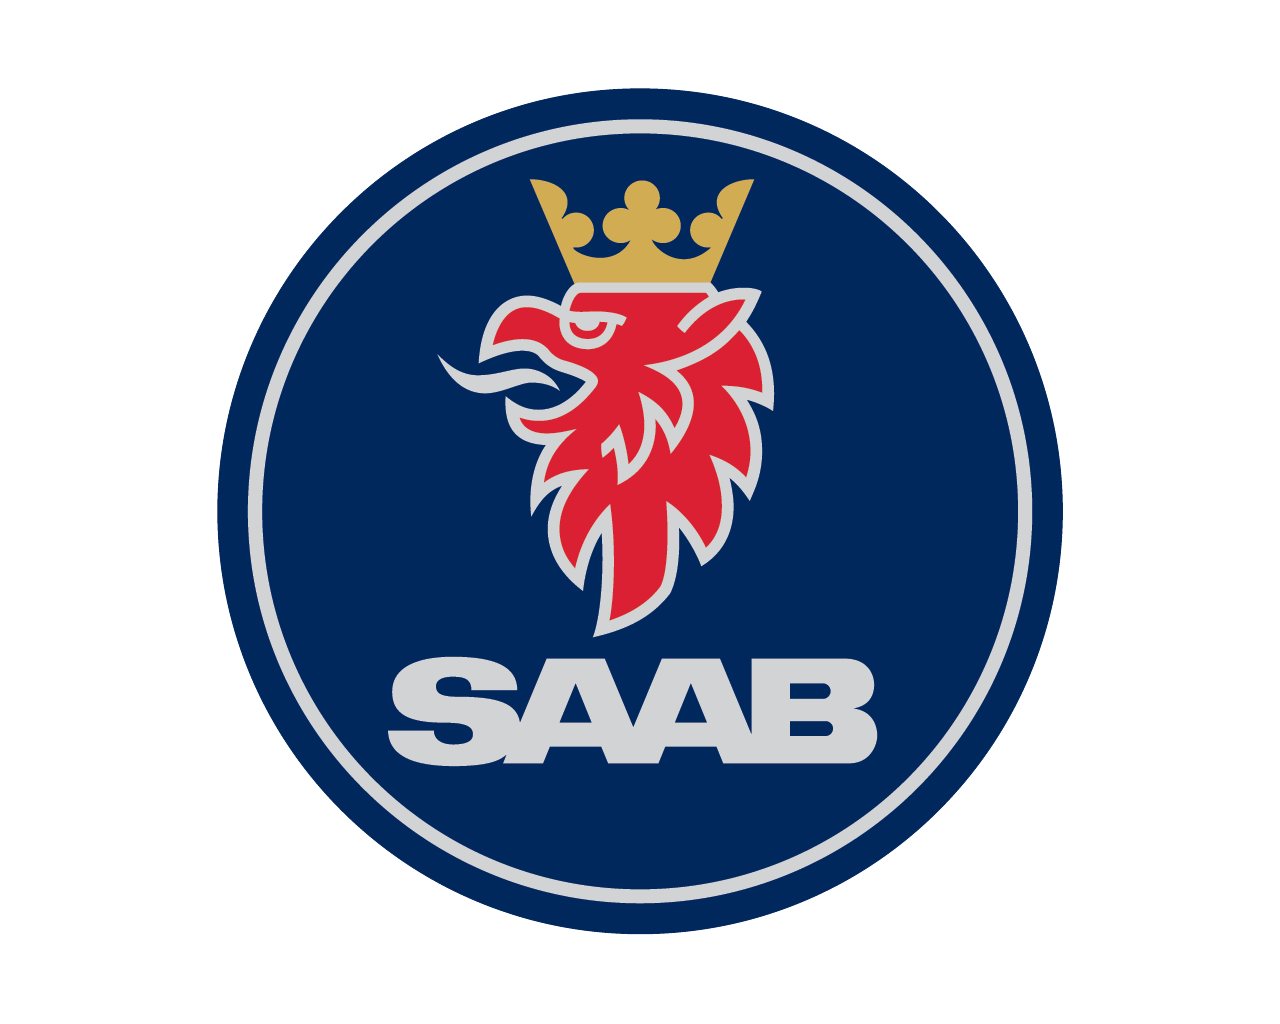 Saab-logo-2000-1280x1024.png